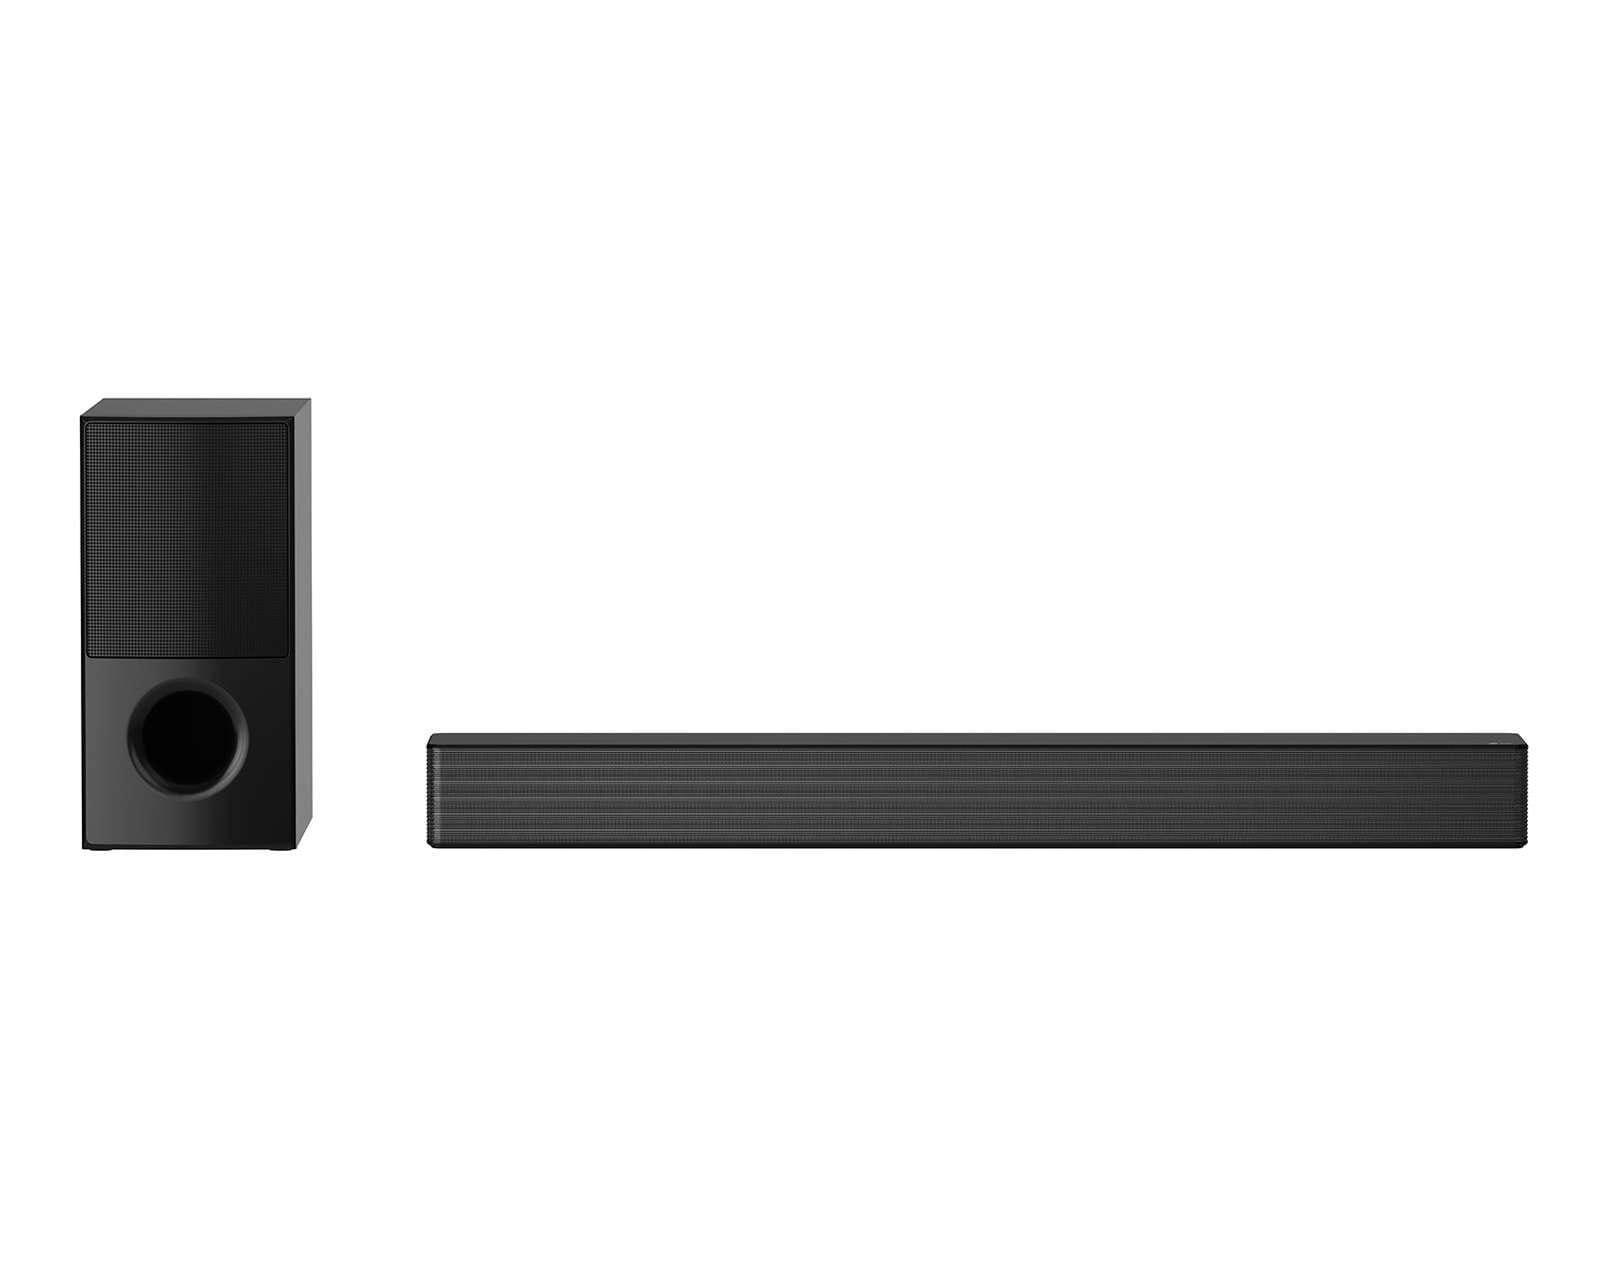 Barra de Sonido LG SNH5 Bluetooth